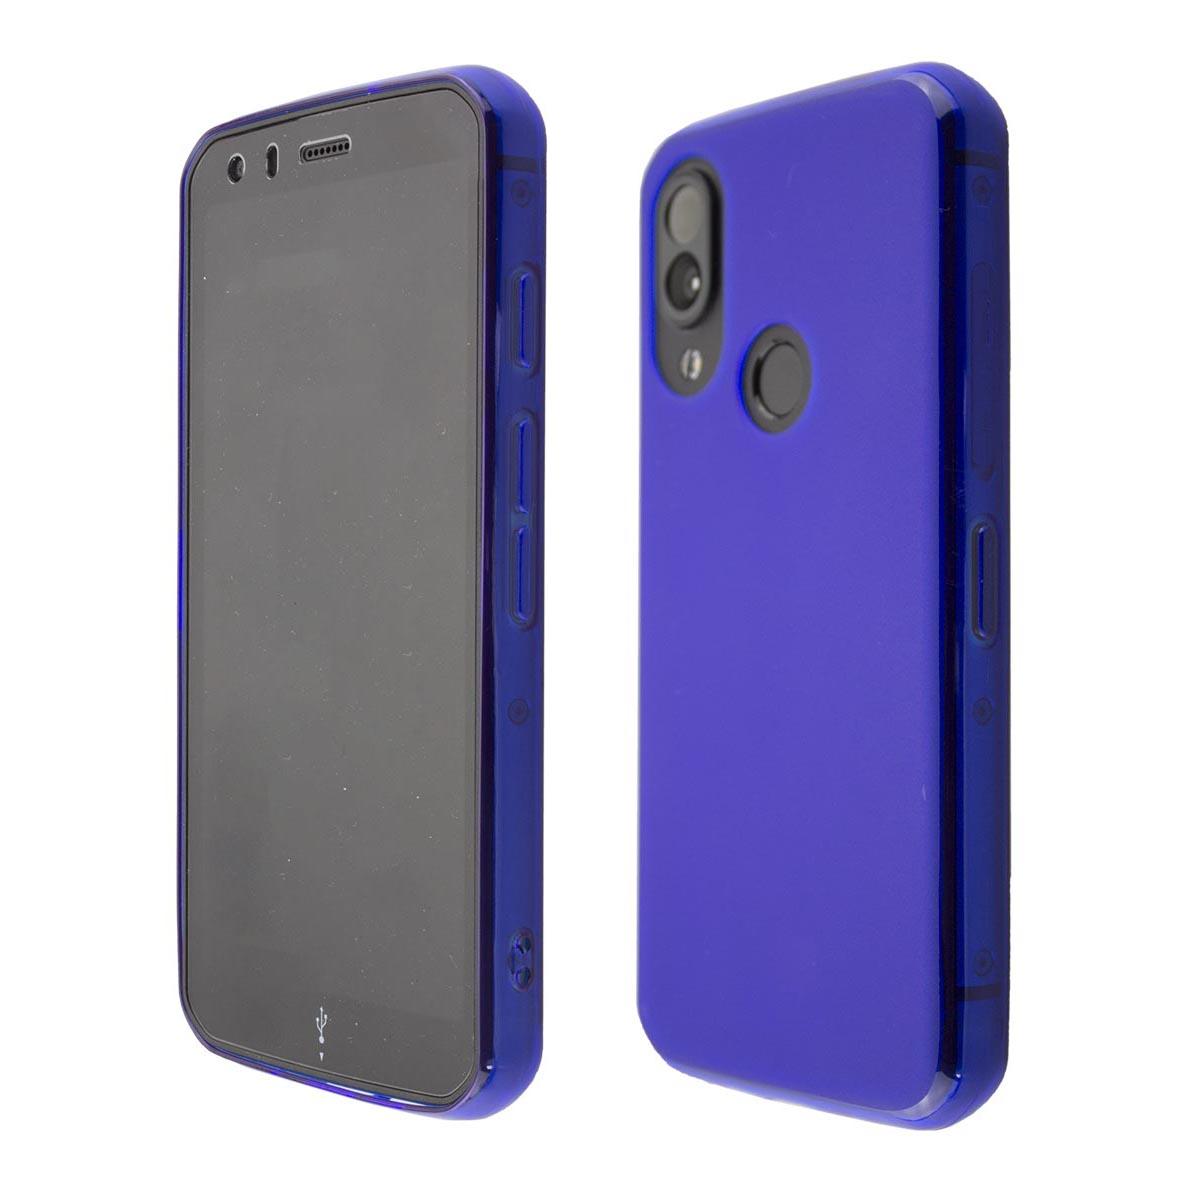 Caseroxx-TPU-Case-pour-Cat-S62-Pro-fait-de-TPU miniature 9